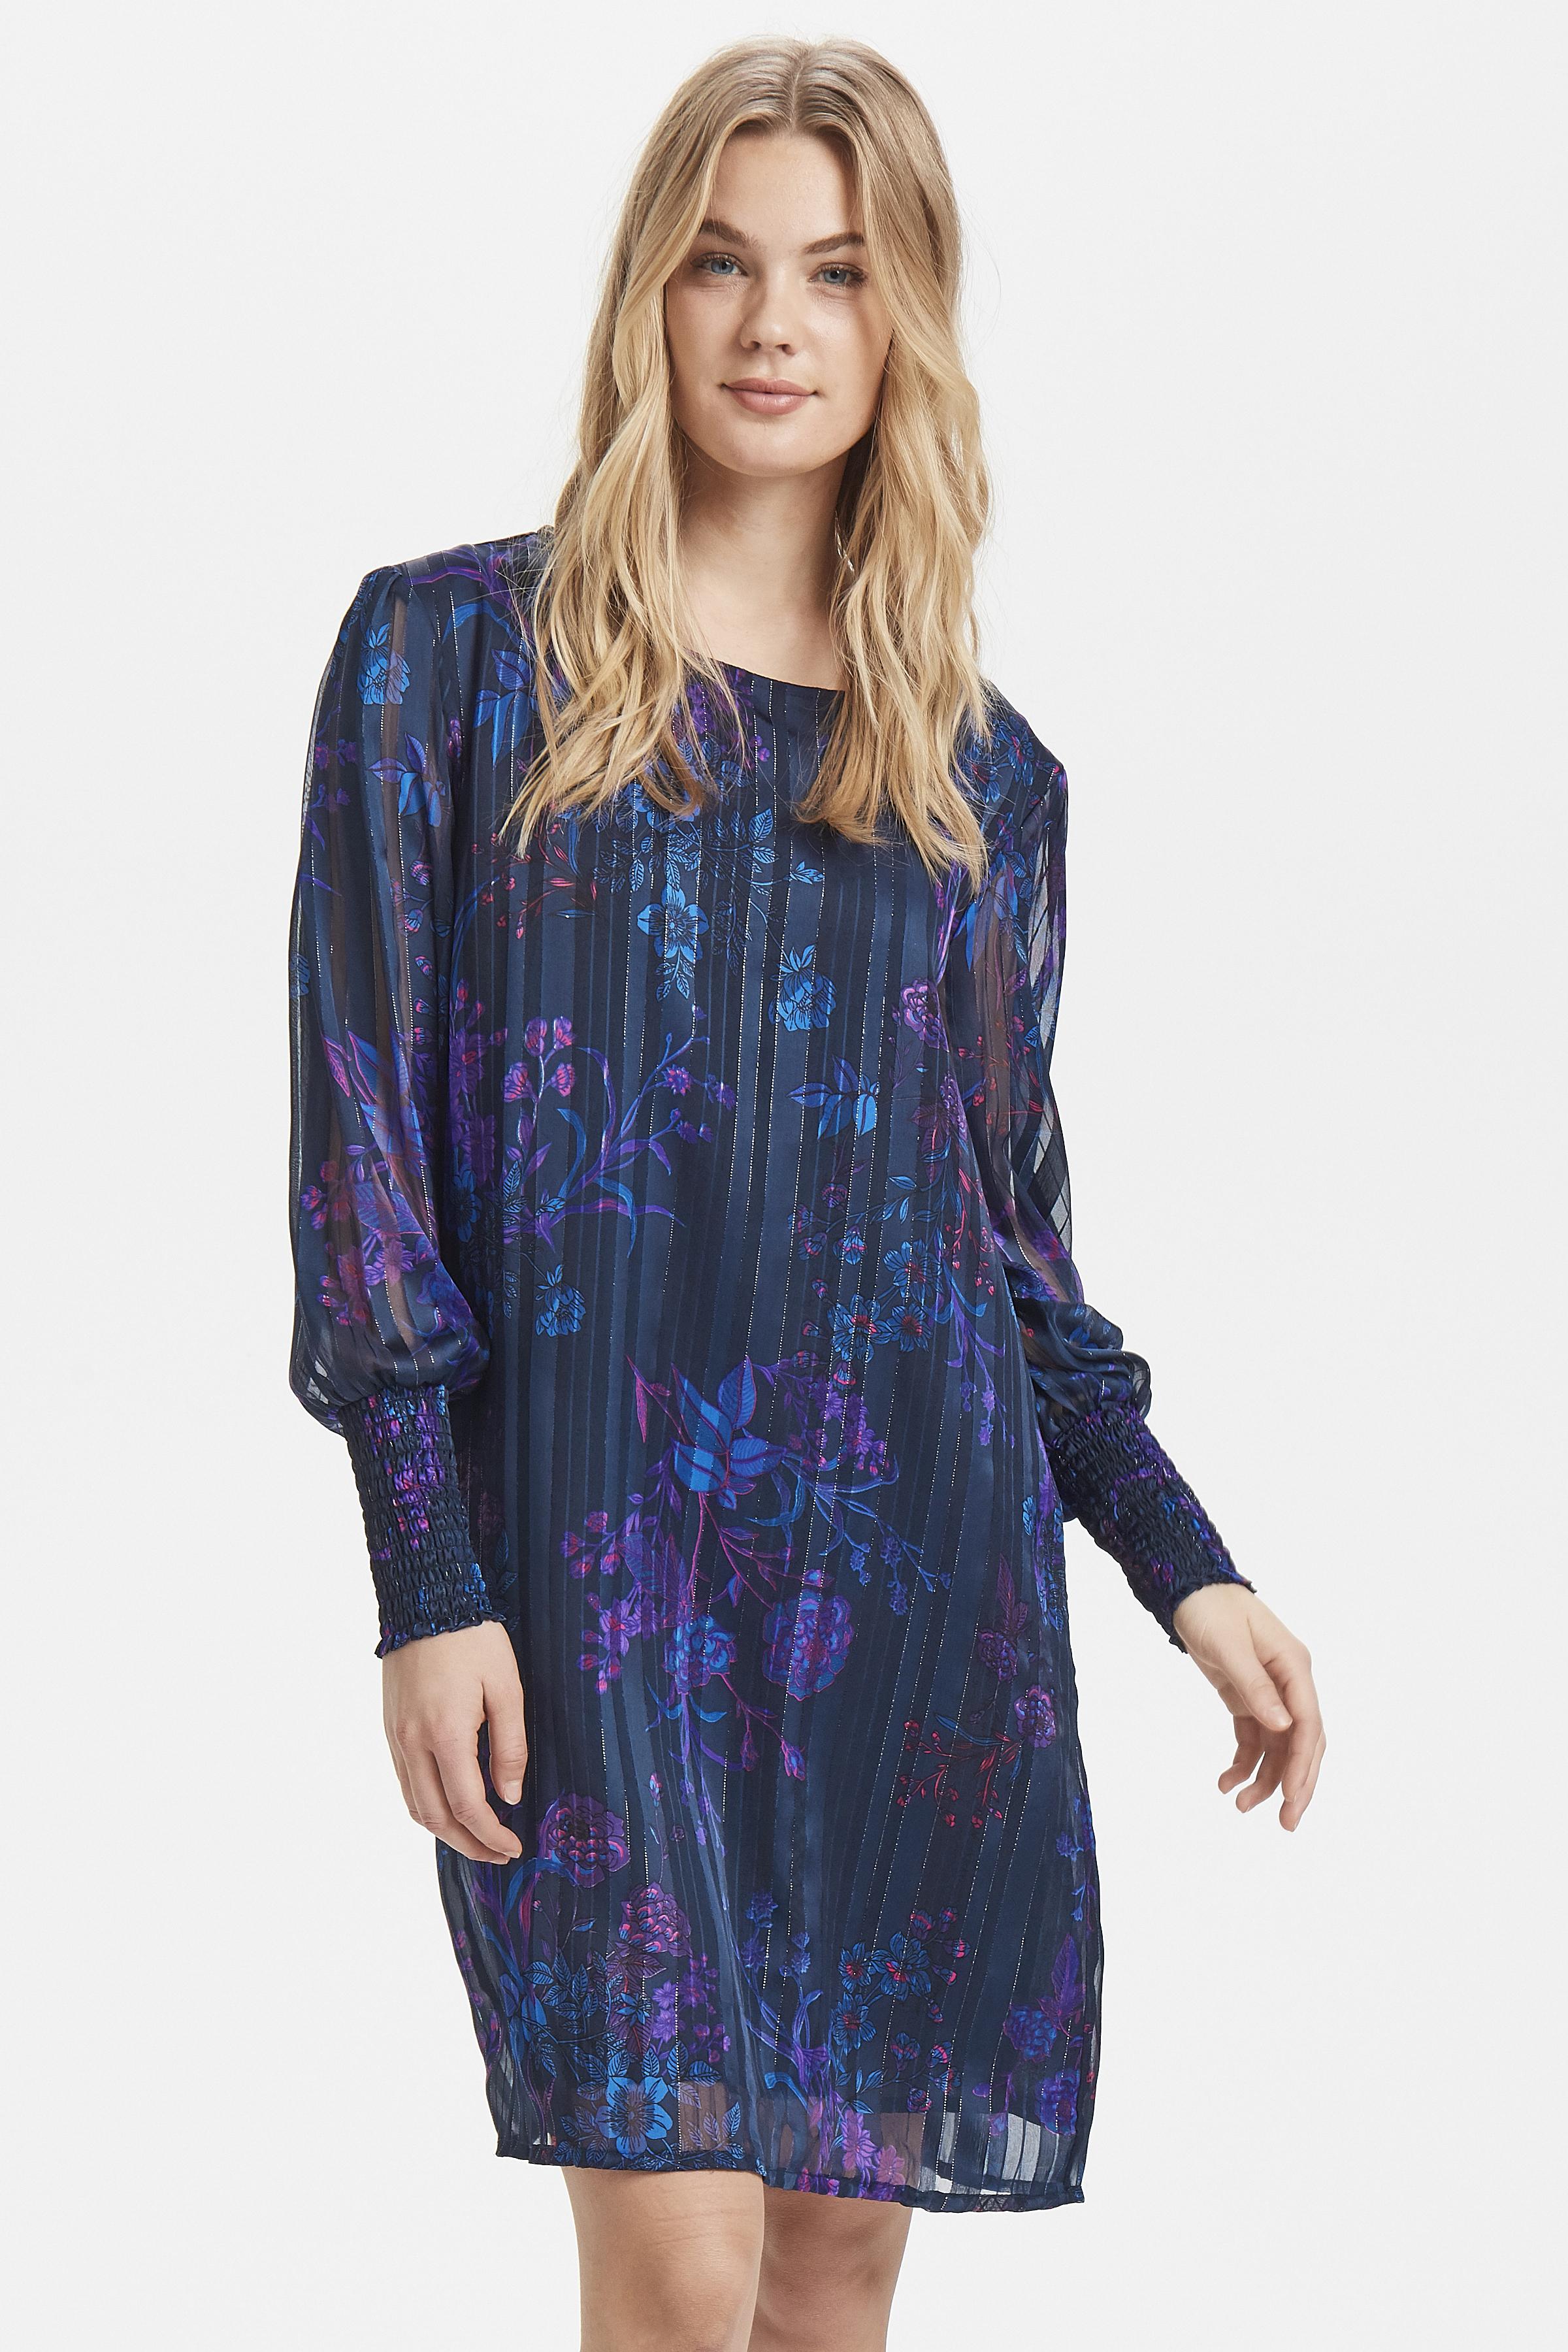 Copenhagen night Combi Dress from b.young – Buy Copenhagen night Combi Dress from size 36-46 here